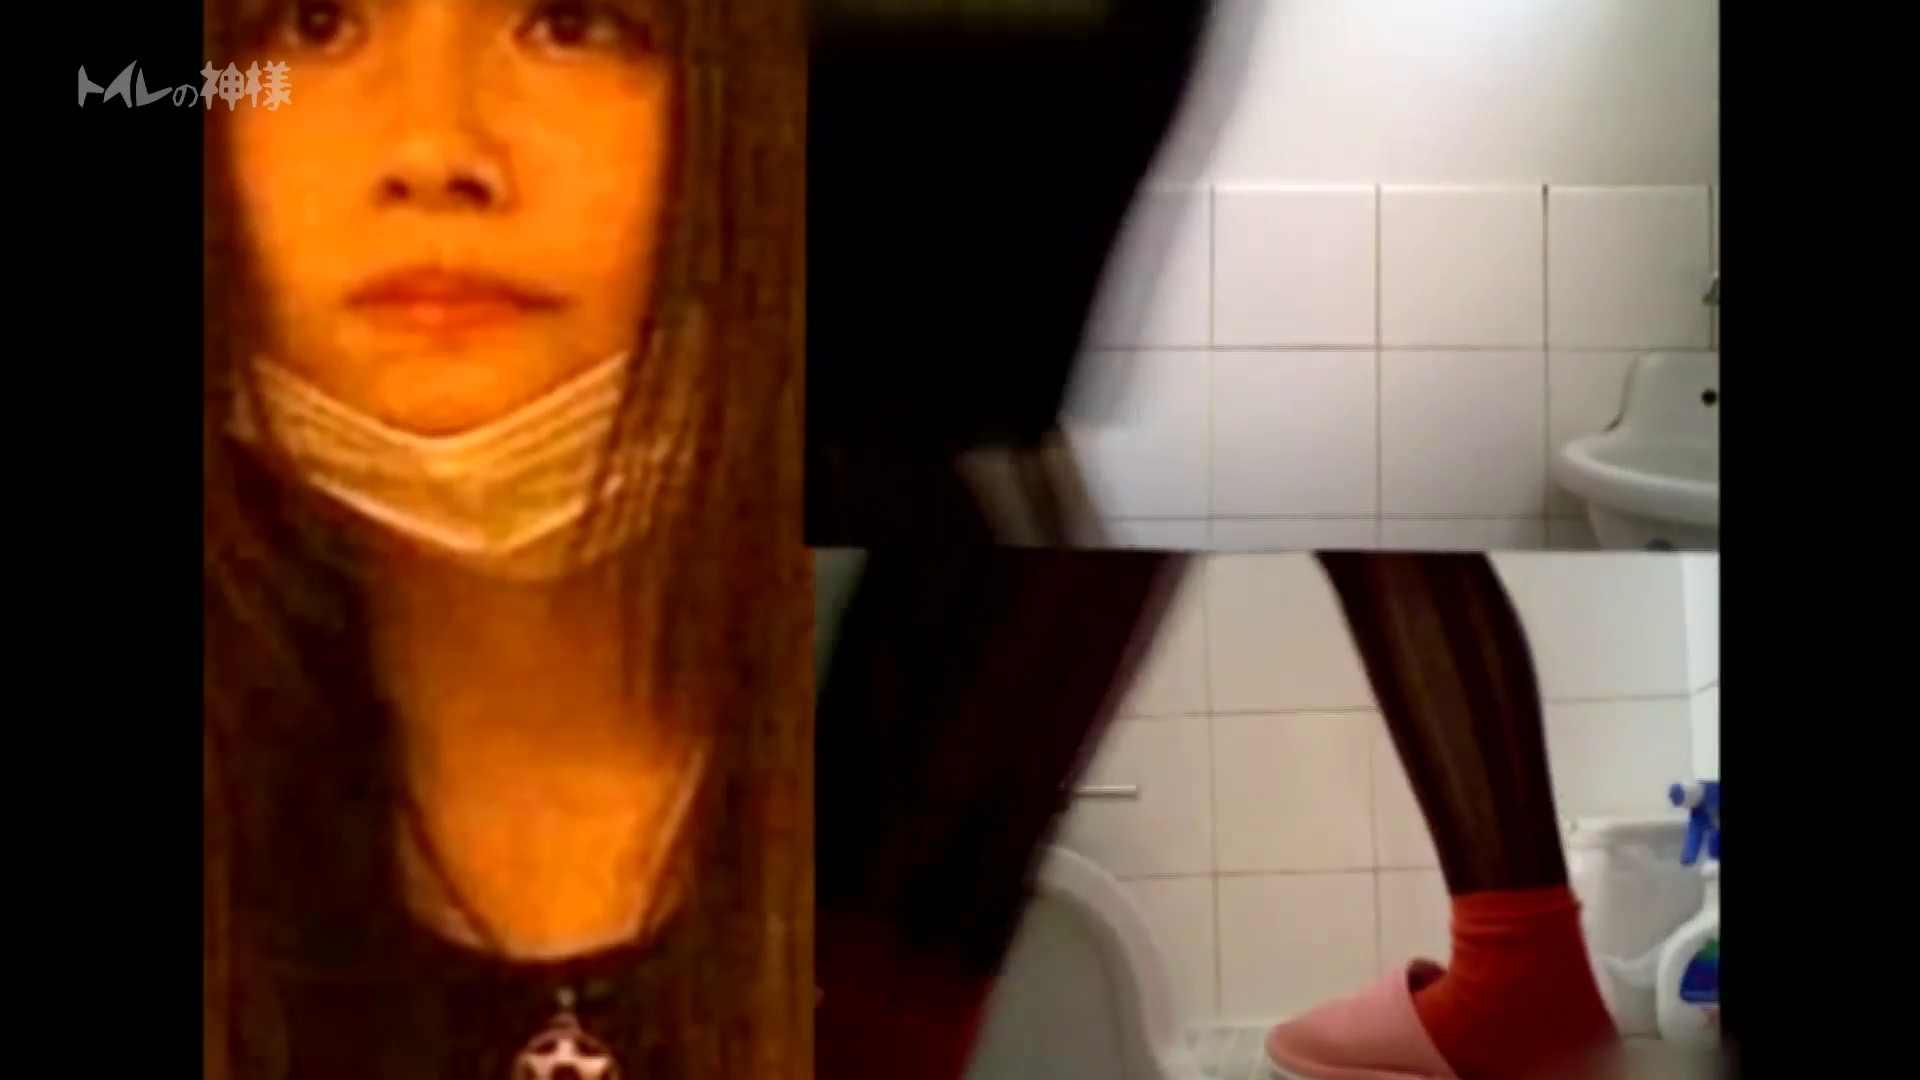 Vol.02 花の女子大生うんこ盗撮2 色っぽい女子大生 AV無料動画キャプチャ 82pic 43